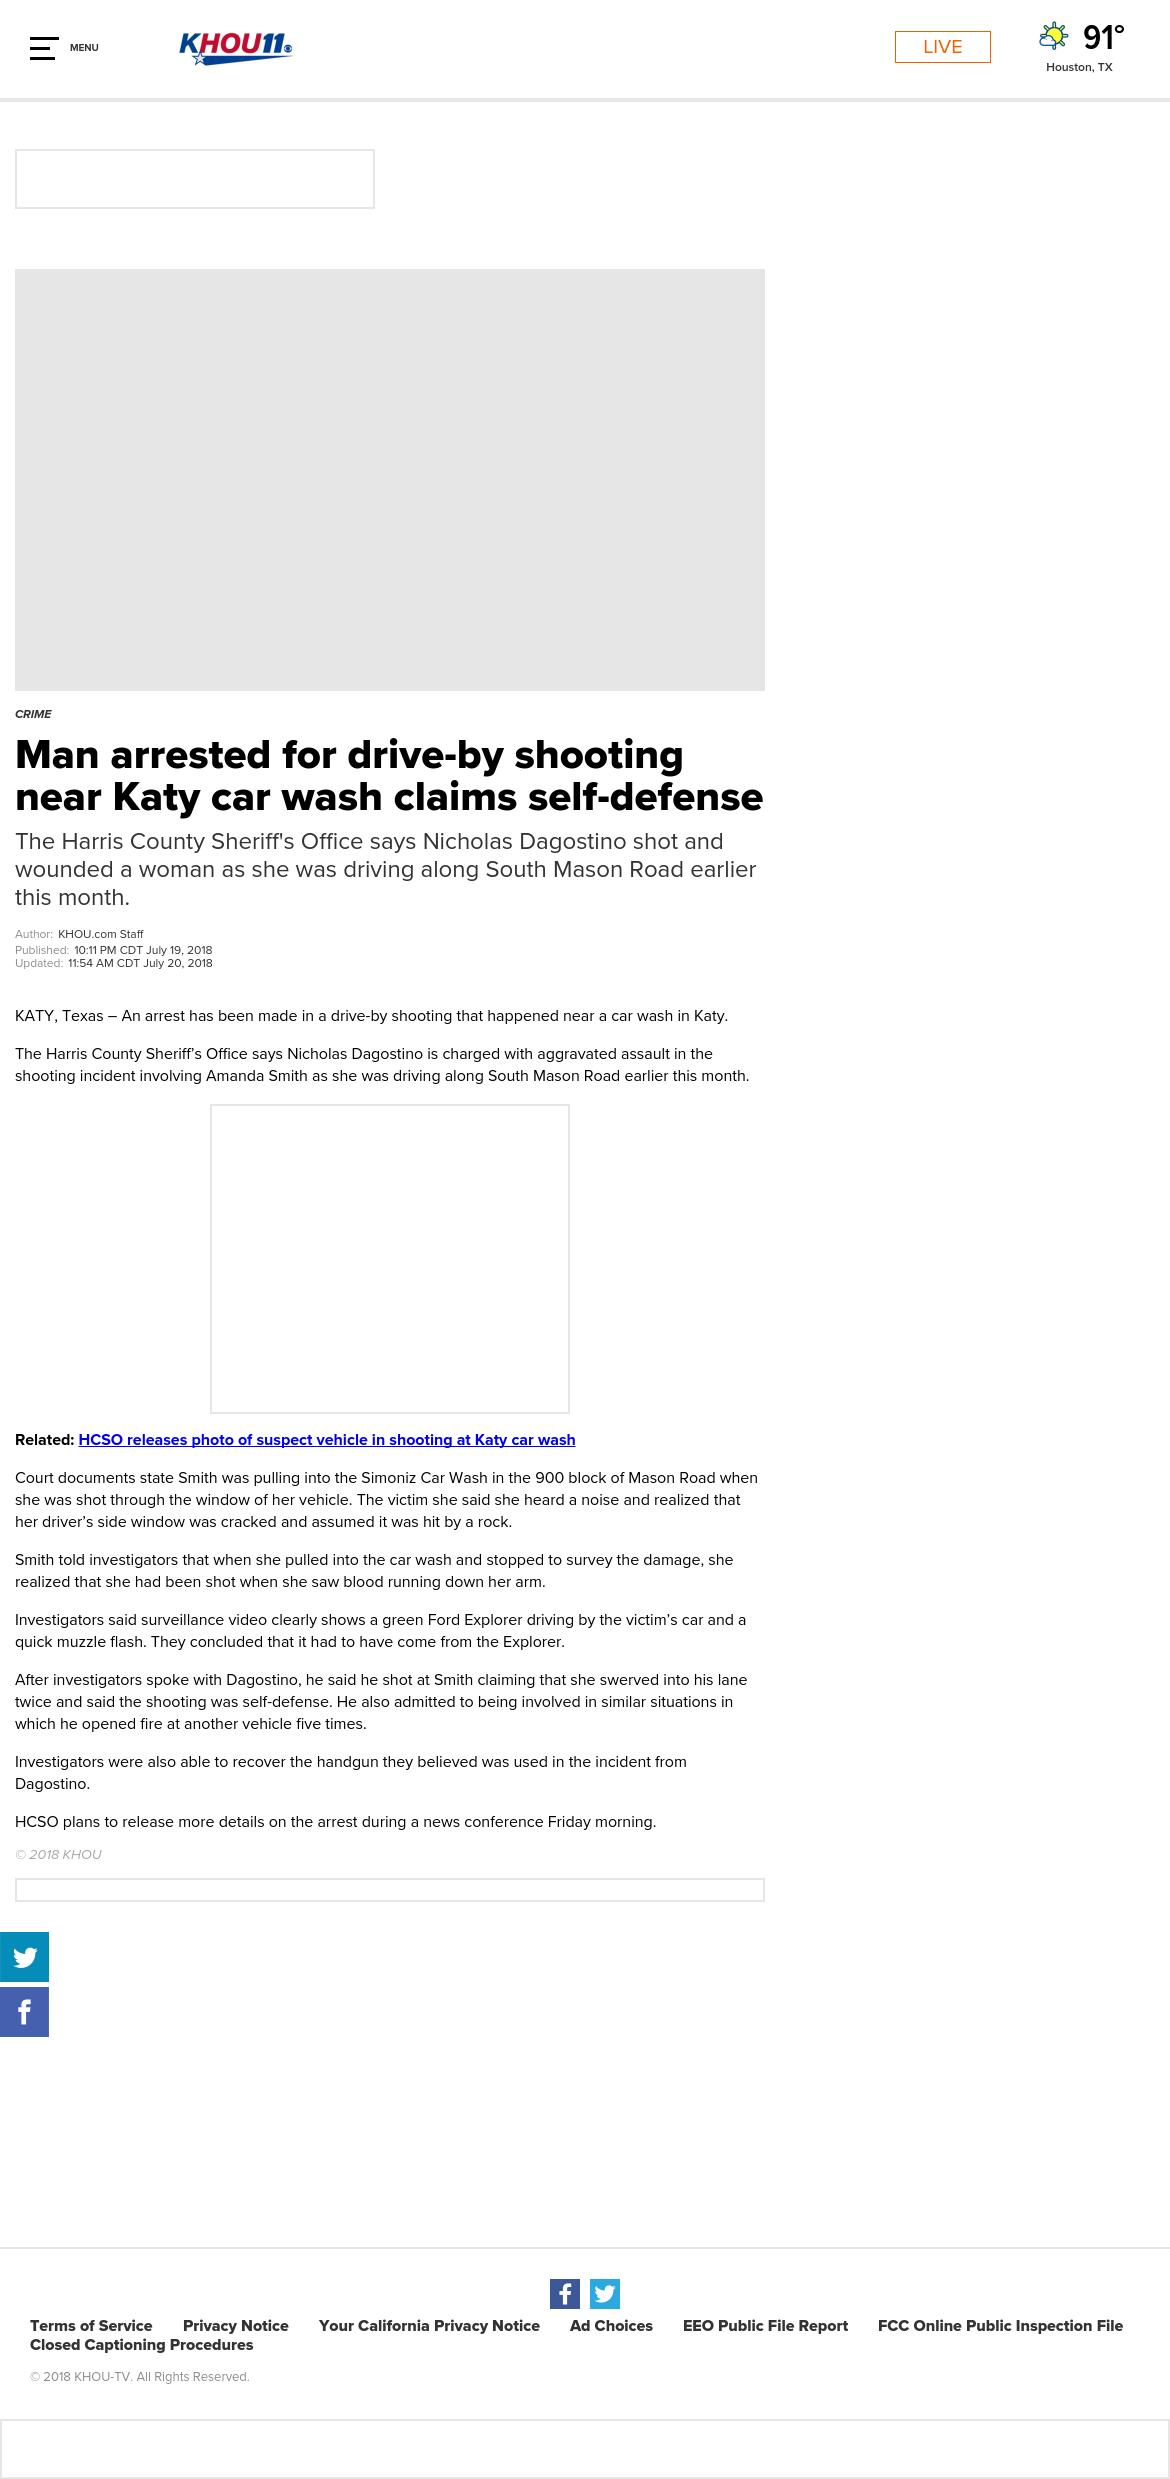 Incident gun violence archive 7 10 18 texas katy 1 1 solutioingenieria Gallery